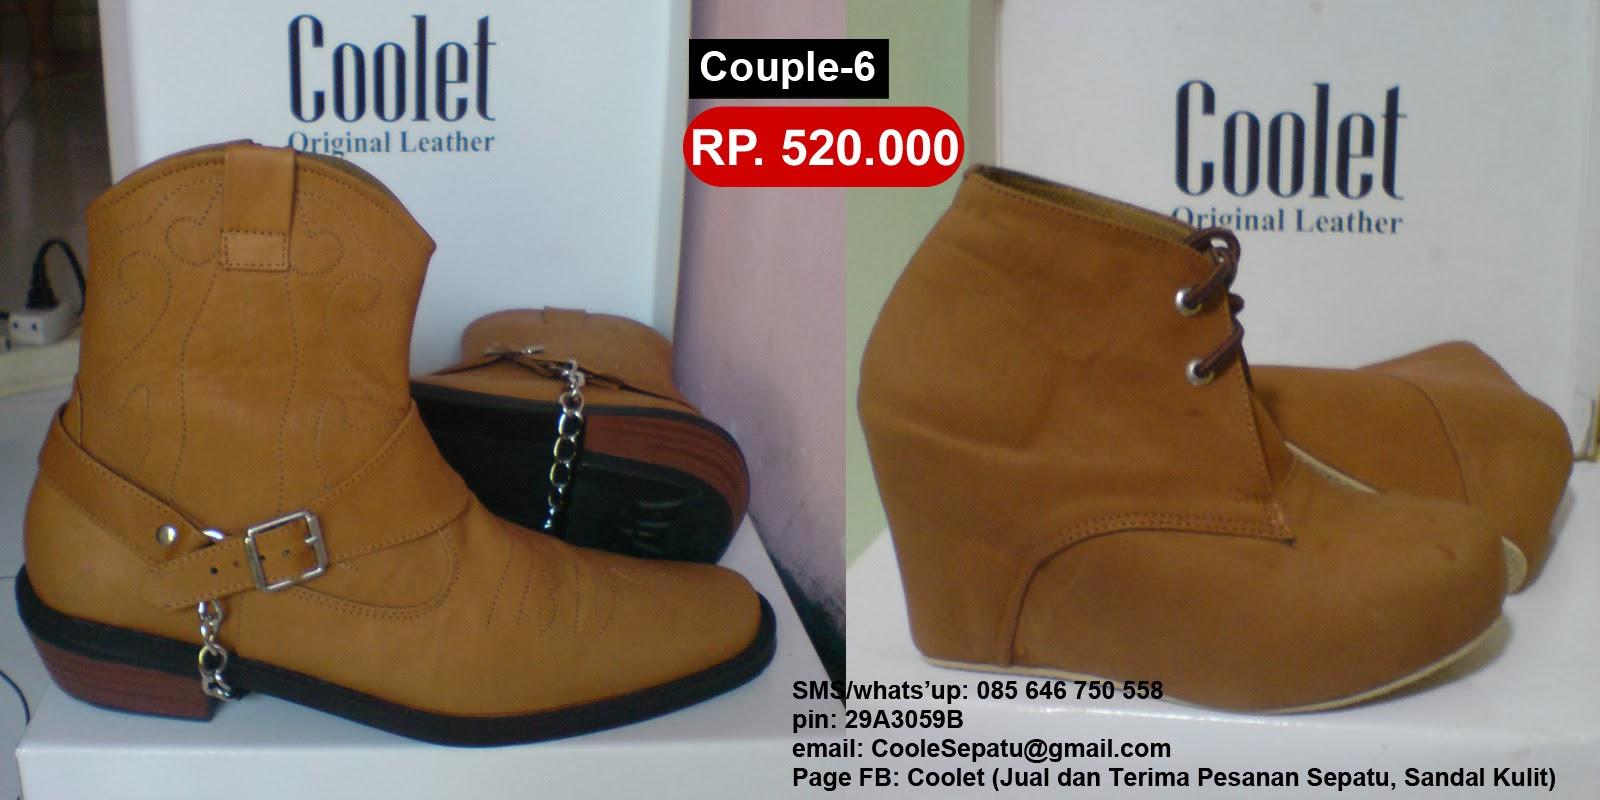 Jual Sepatu Kulit Pesan Murah 085646750558 Pin 29a3059b Safety Pendek Model Slop Bahan Asli